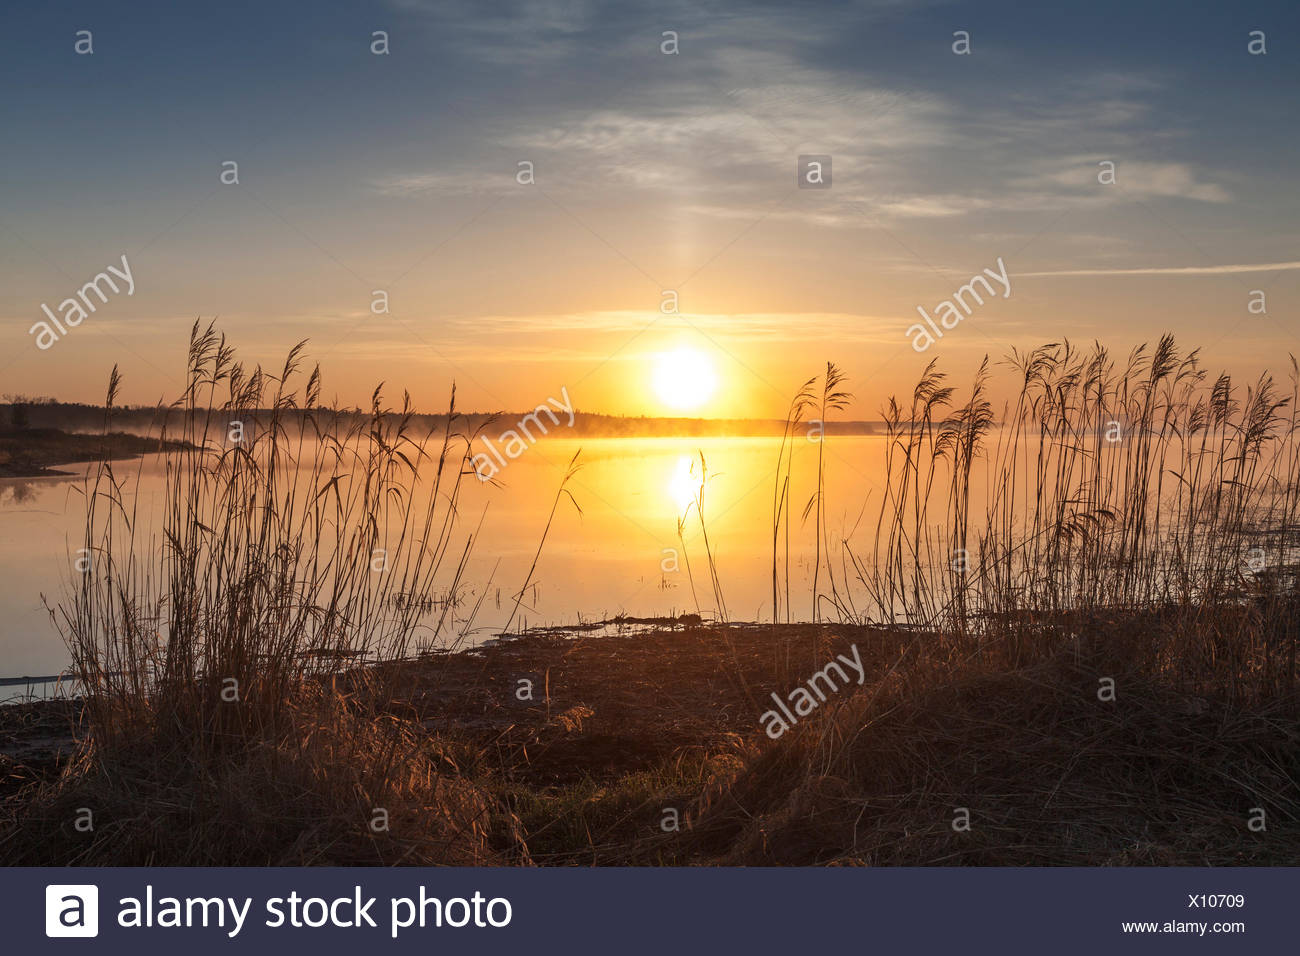 The rising sun, Barrie Island, Manitoulin Island, Ontario, Canada - Stock Image